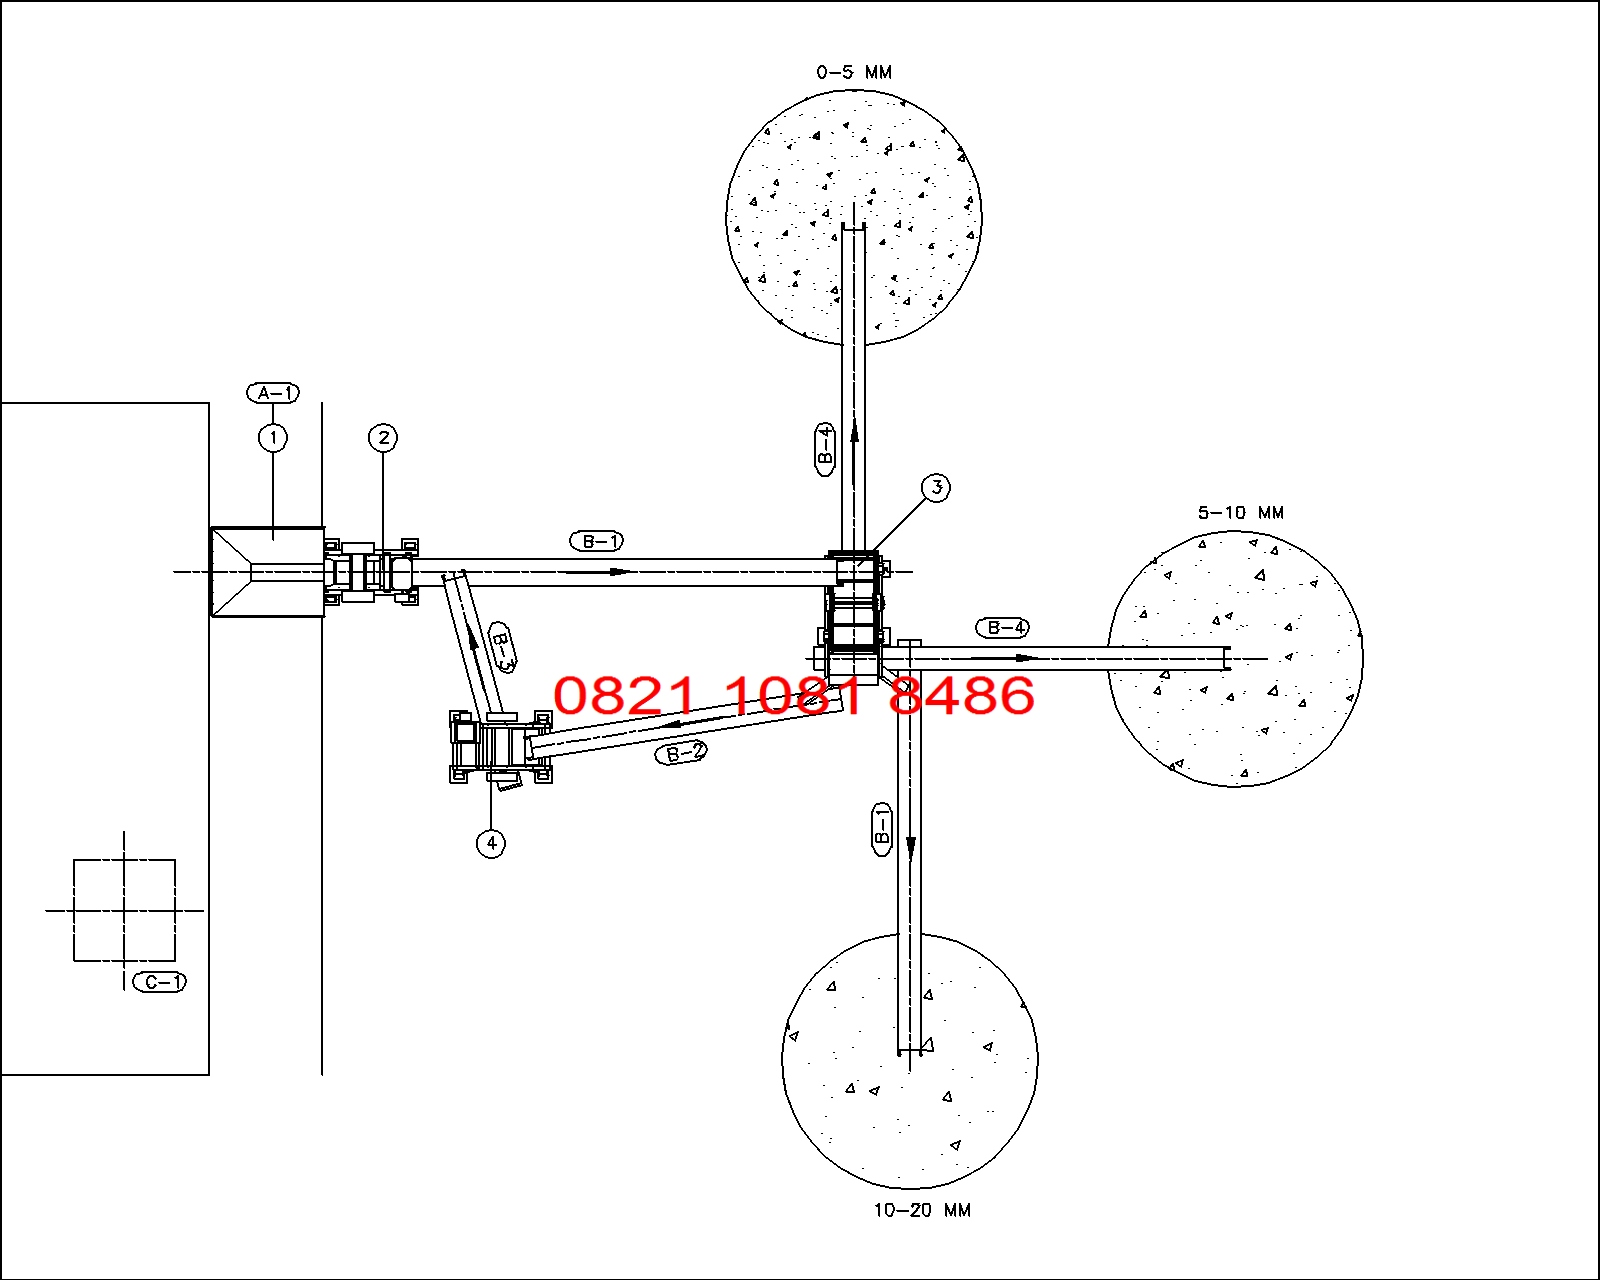 Jual Stone Crusher Plant 30 40 Tph Opsi 01 Jual Stone